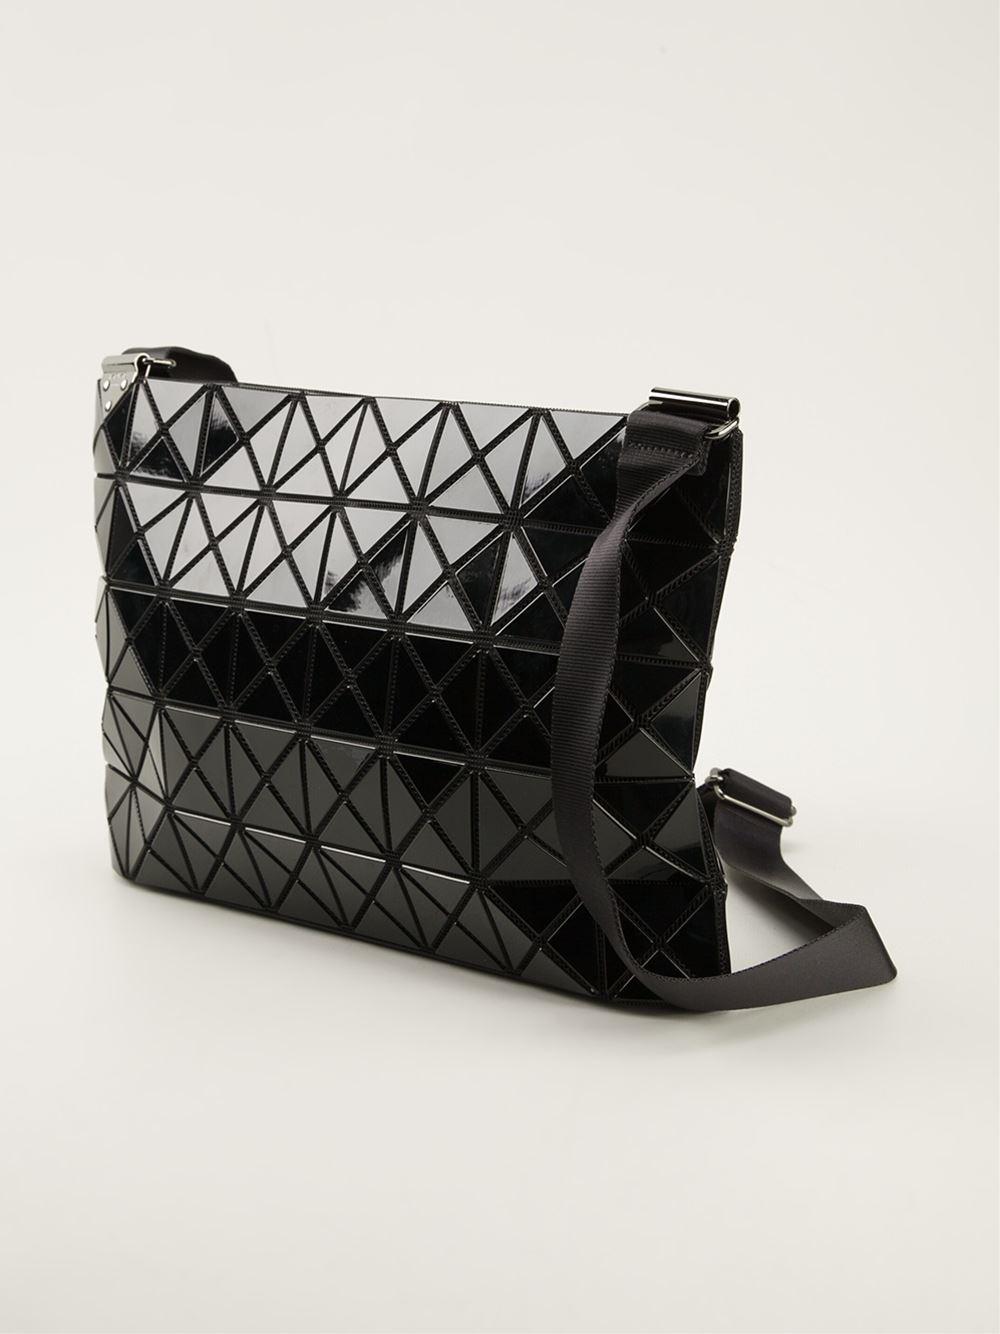 Lyst - Bao Bao Issey Miyake  Prism  Cross Body Bag in Black 6b922009d6003